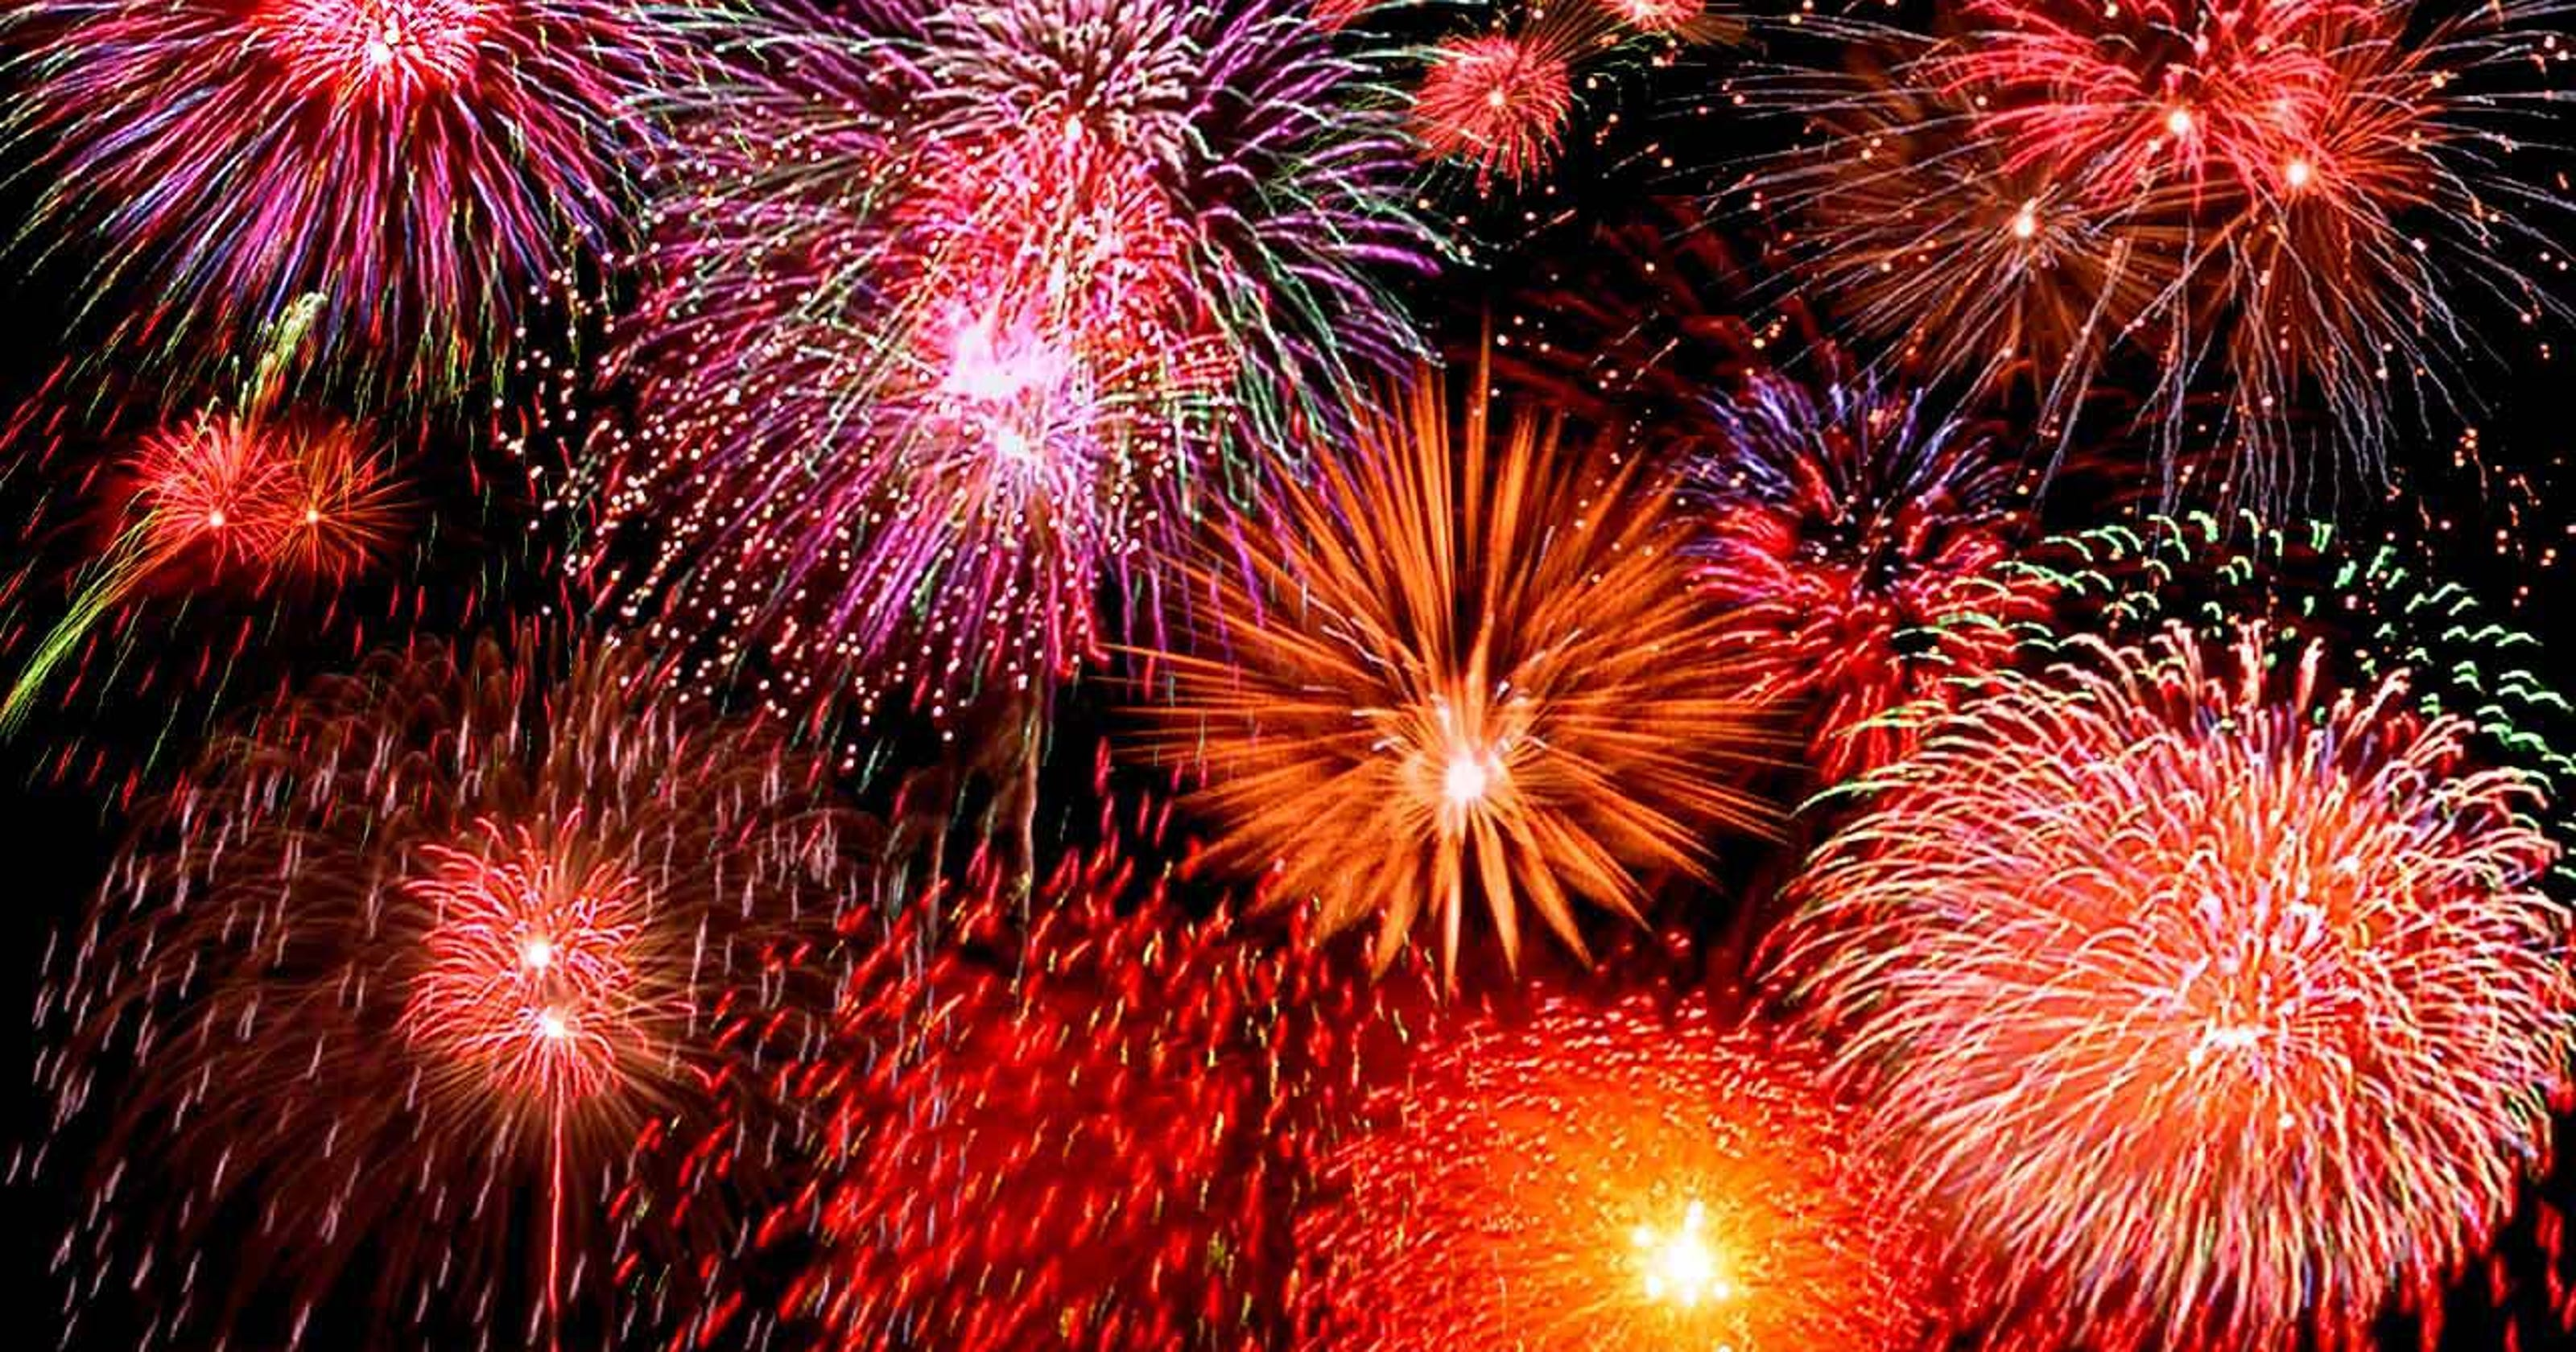 Fireworks tonight in Bridgewater